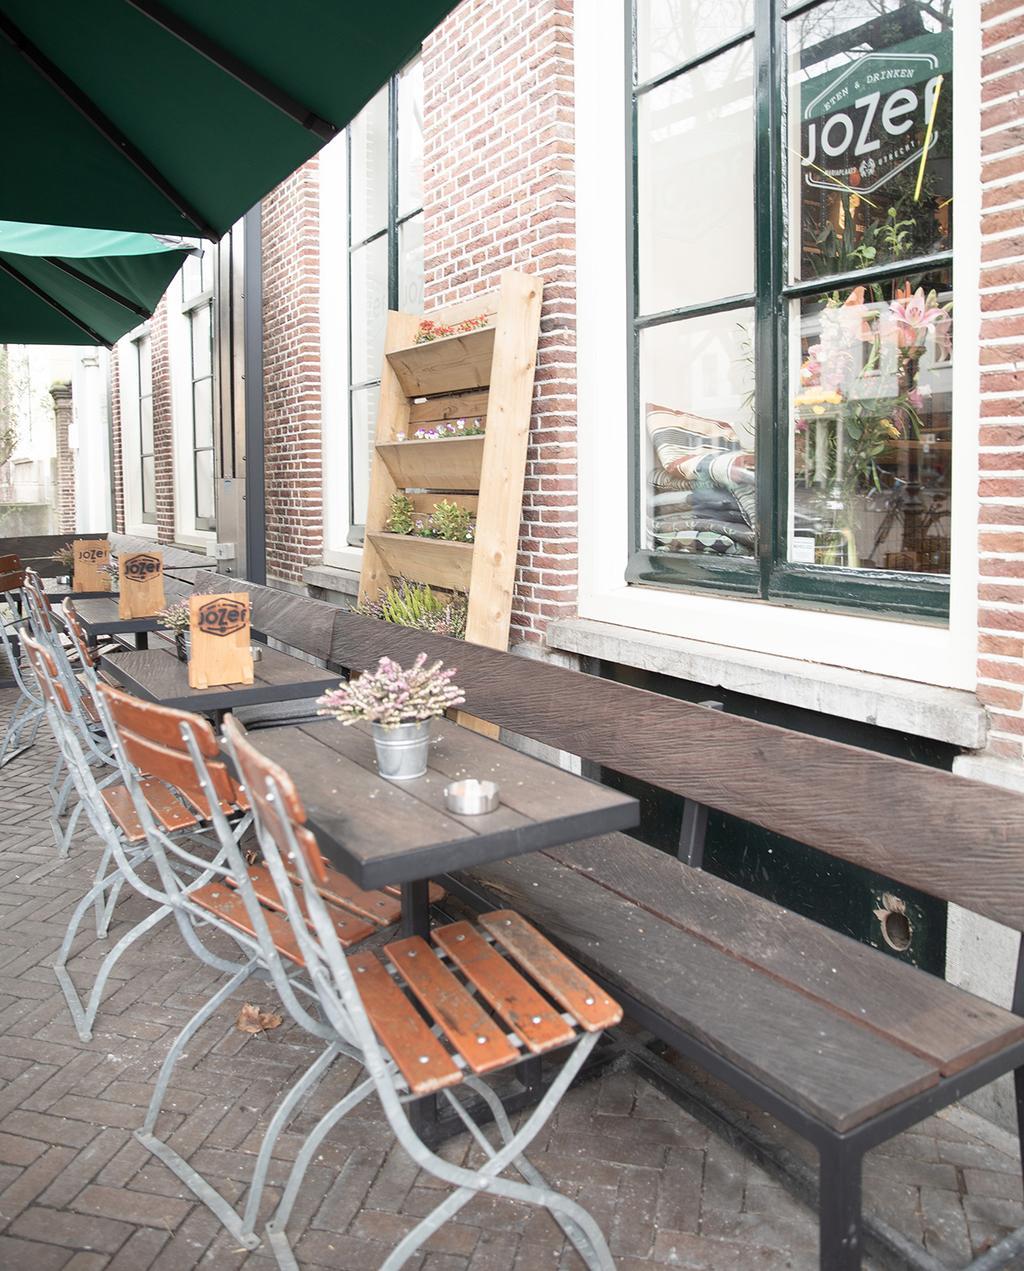 vtwonen 04-2020 | Jozef restaurant Utrecht